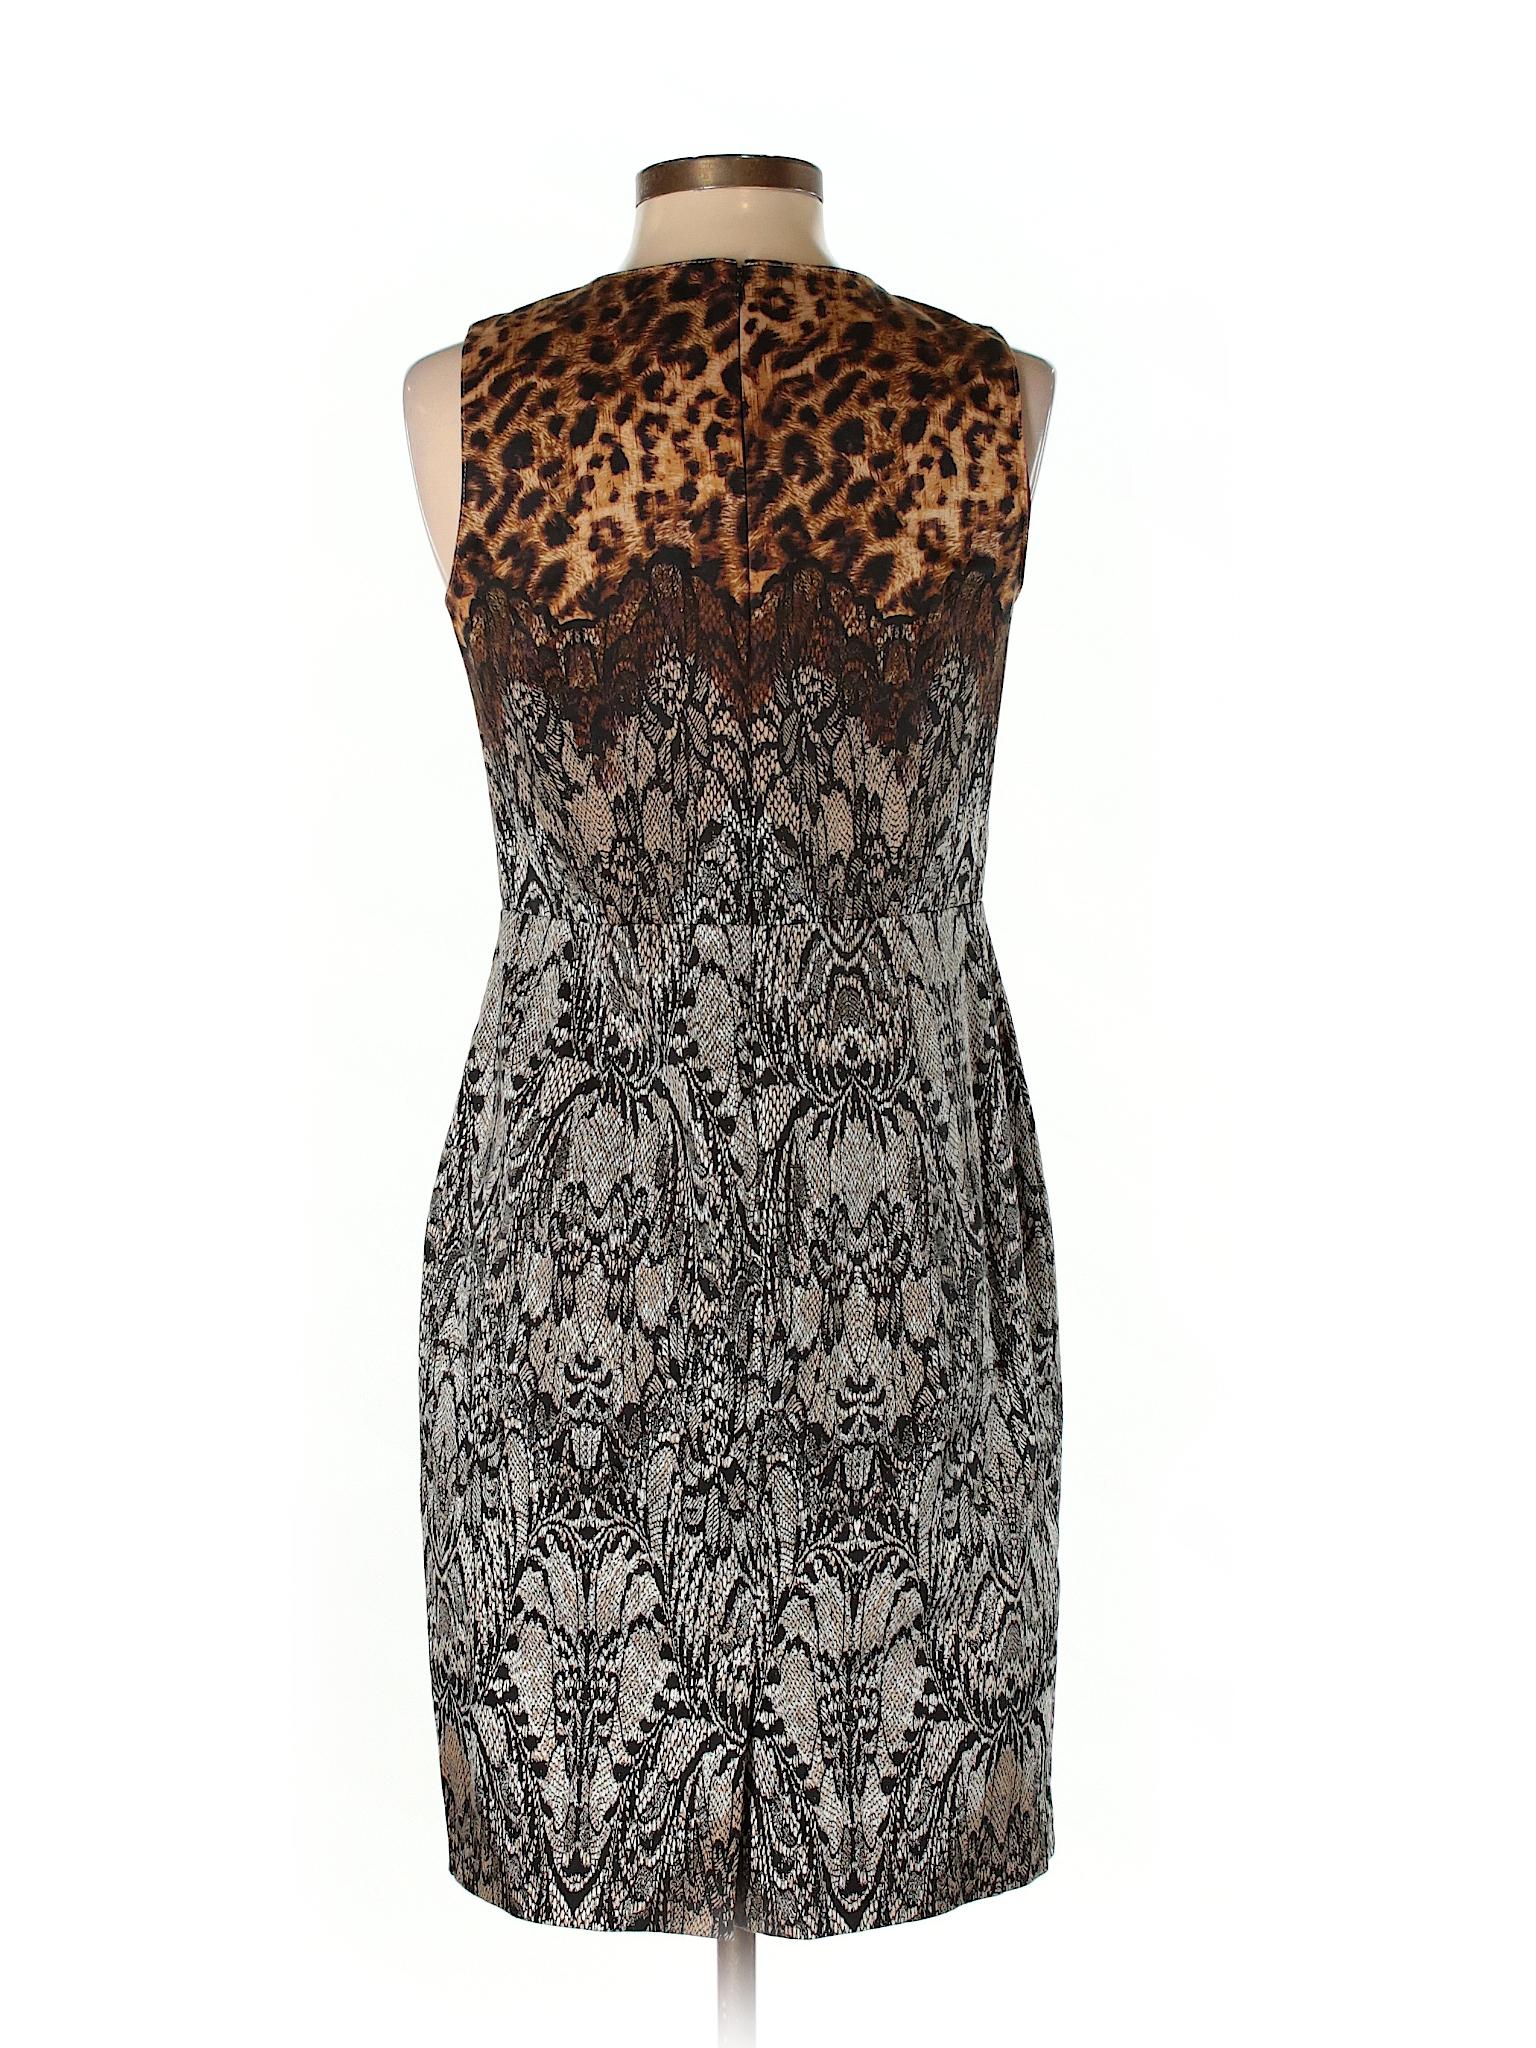 Ann Casual Boutique Dress winter Taylor H5wxqOB1U